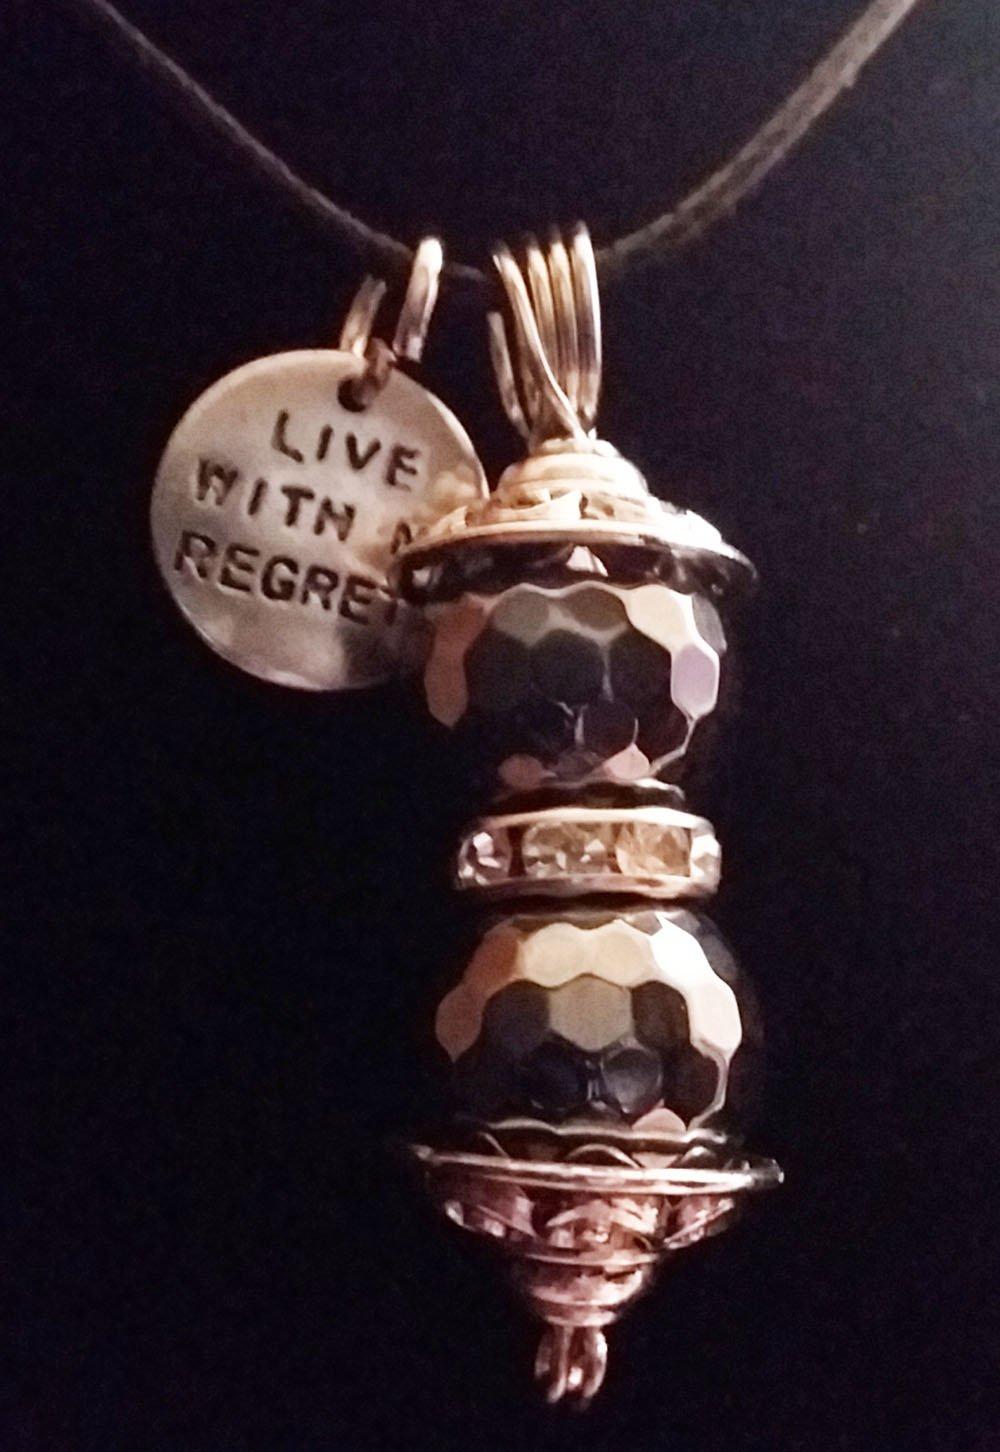 Hematite Gemstone Necklace with Charm